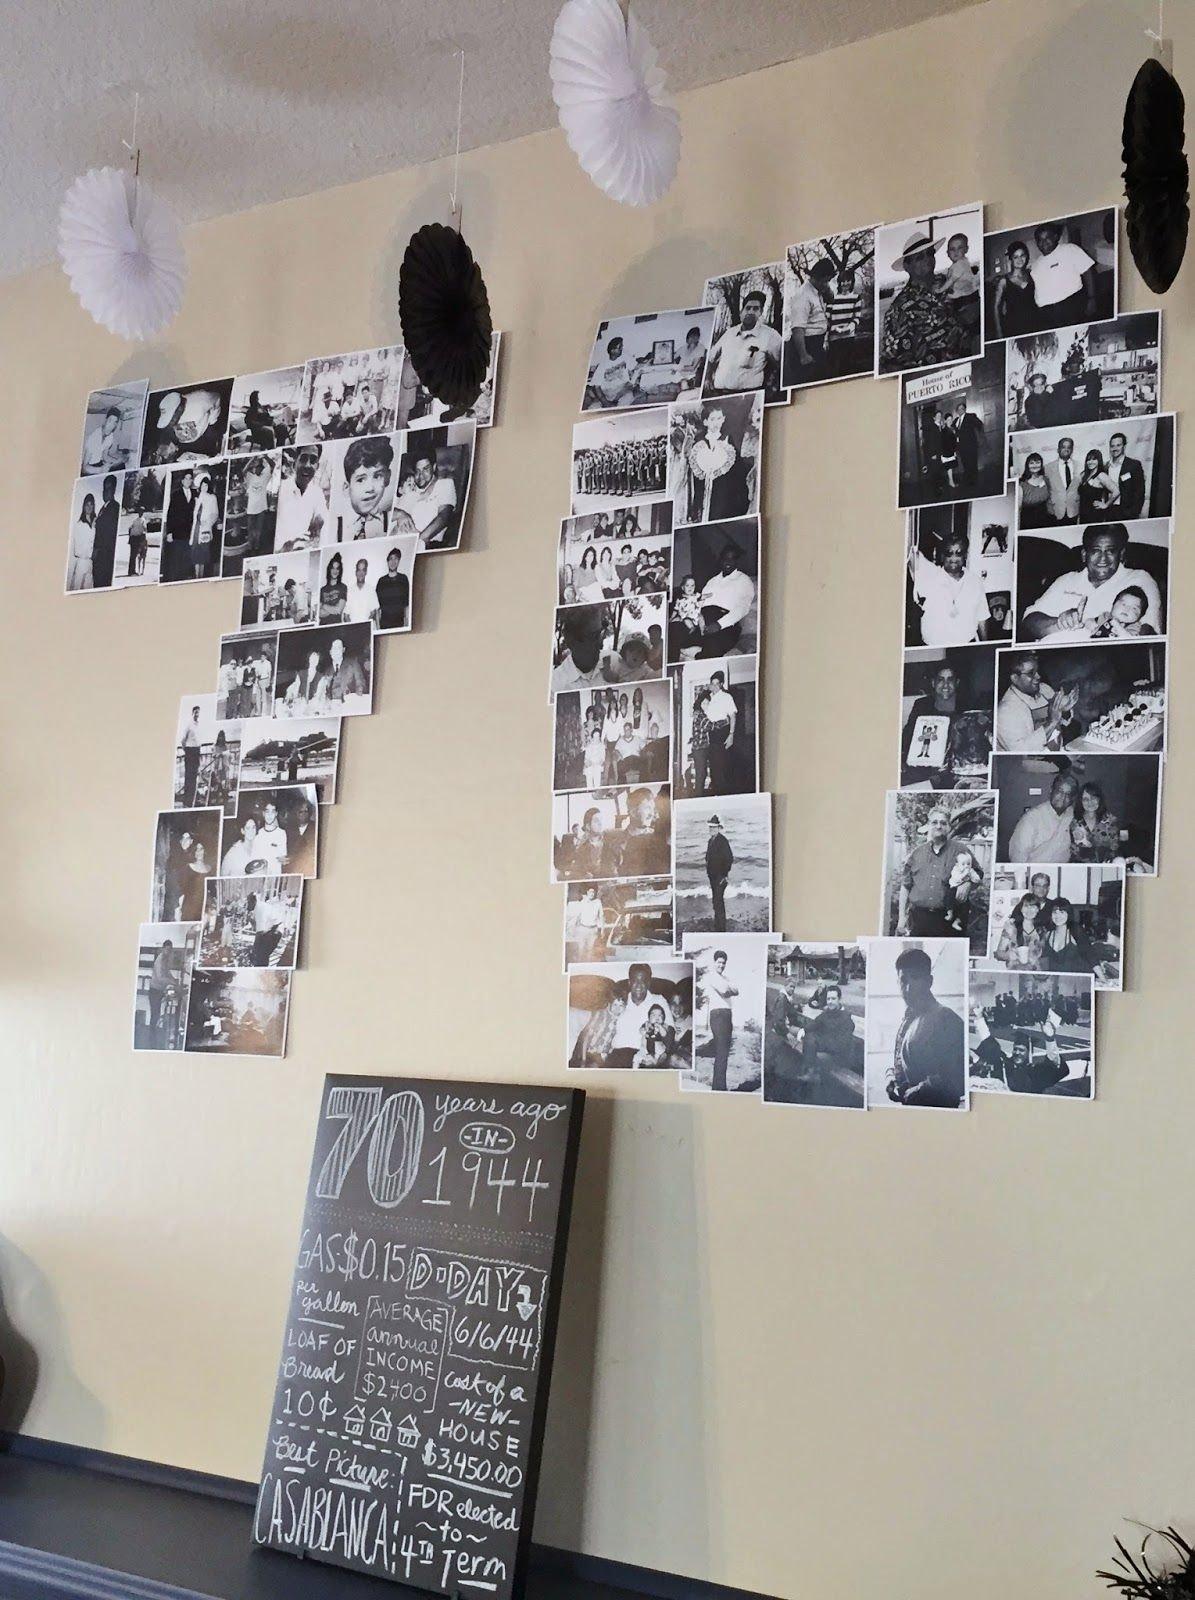 milestone birthday: planning my dad's 70th birthday party | big